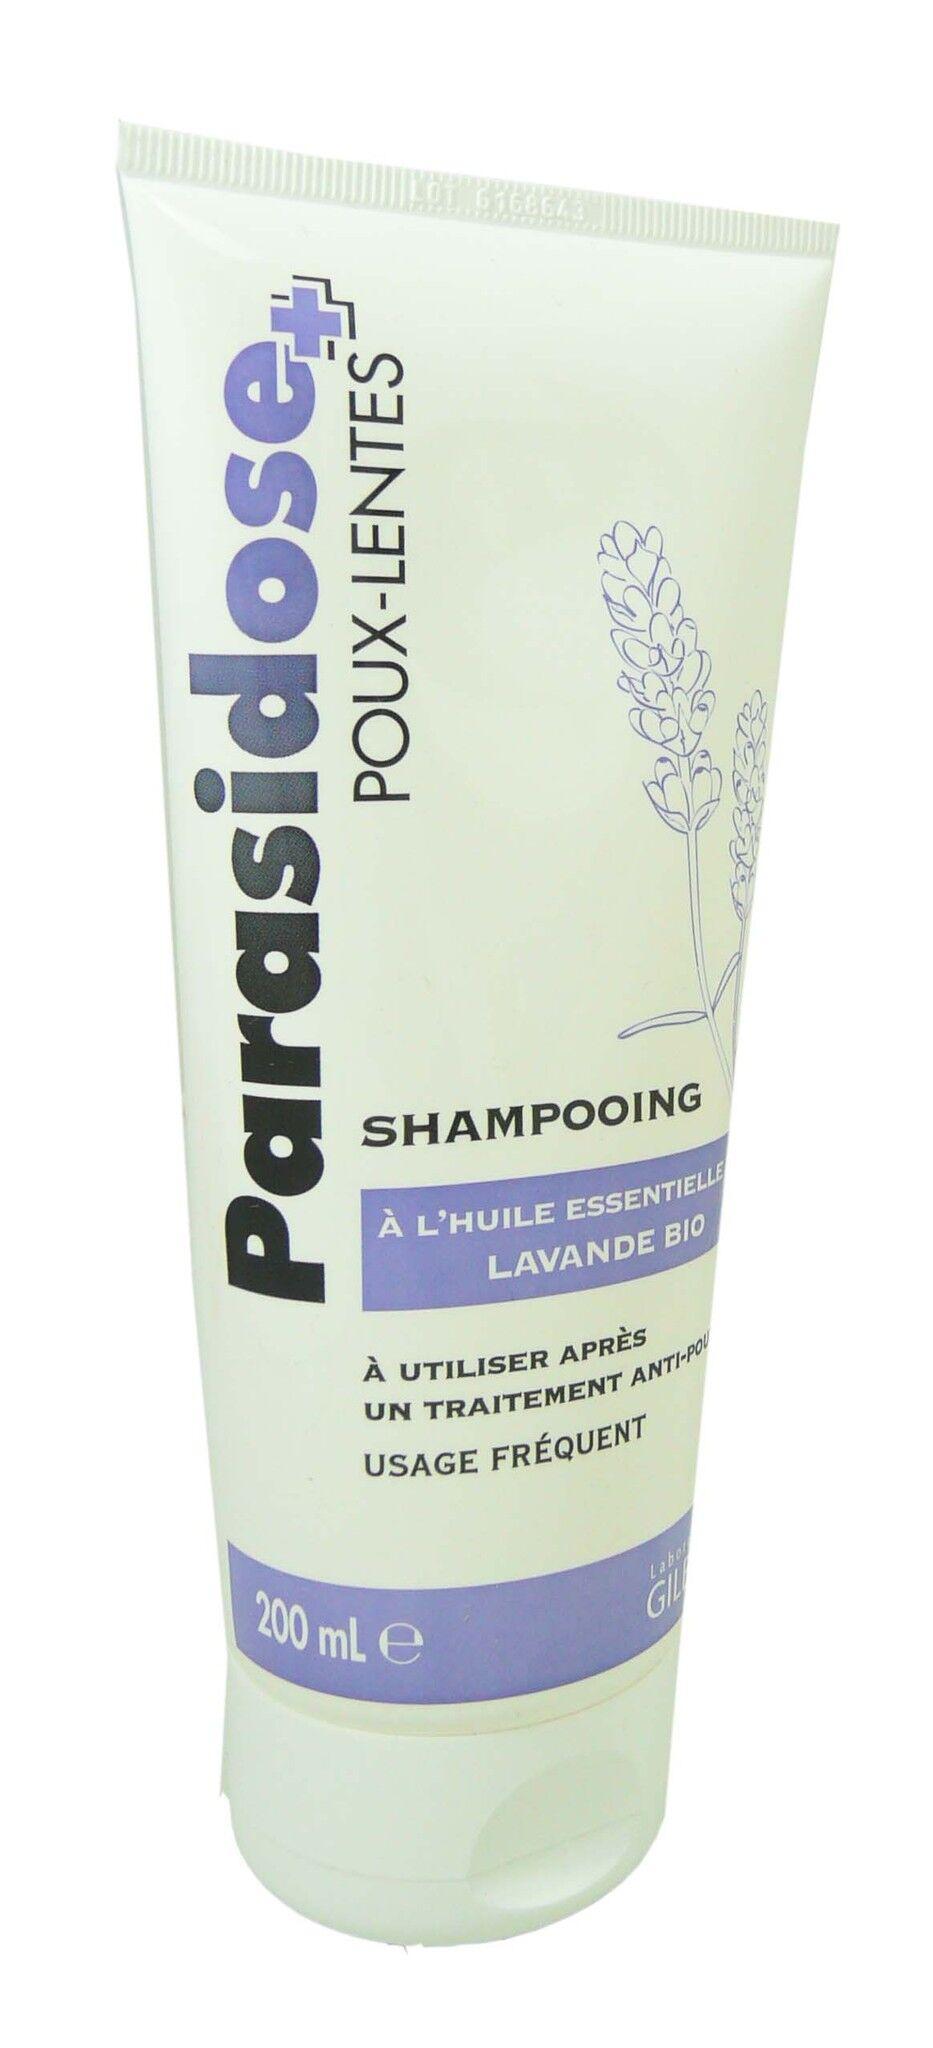 Gilbert parasidose shampooing huile essentielle lavande bio